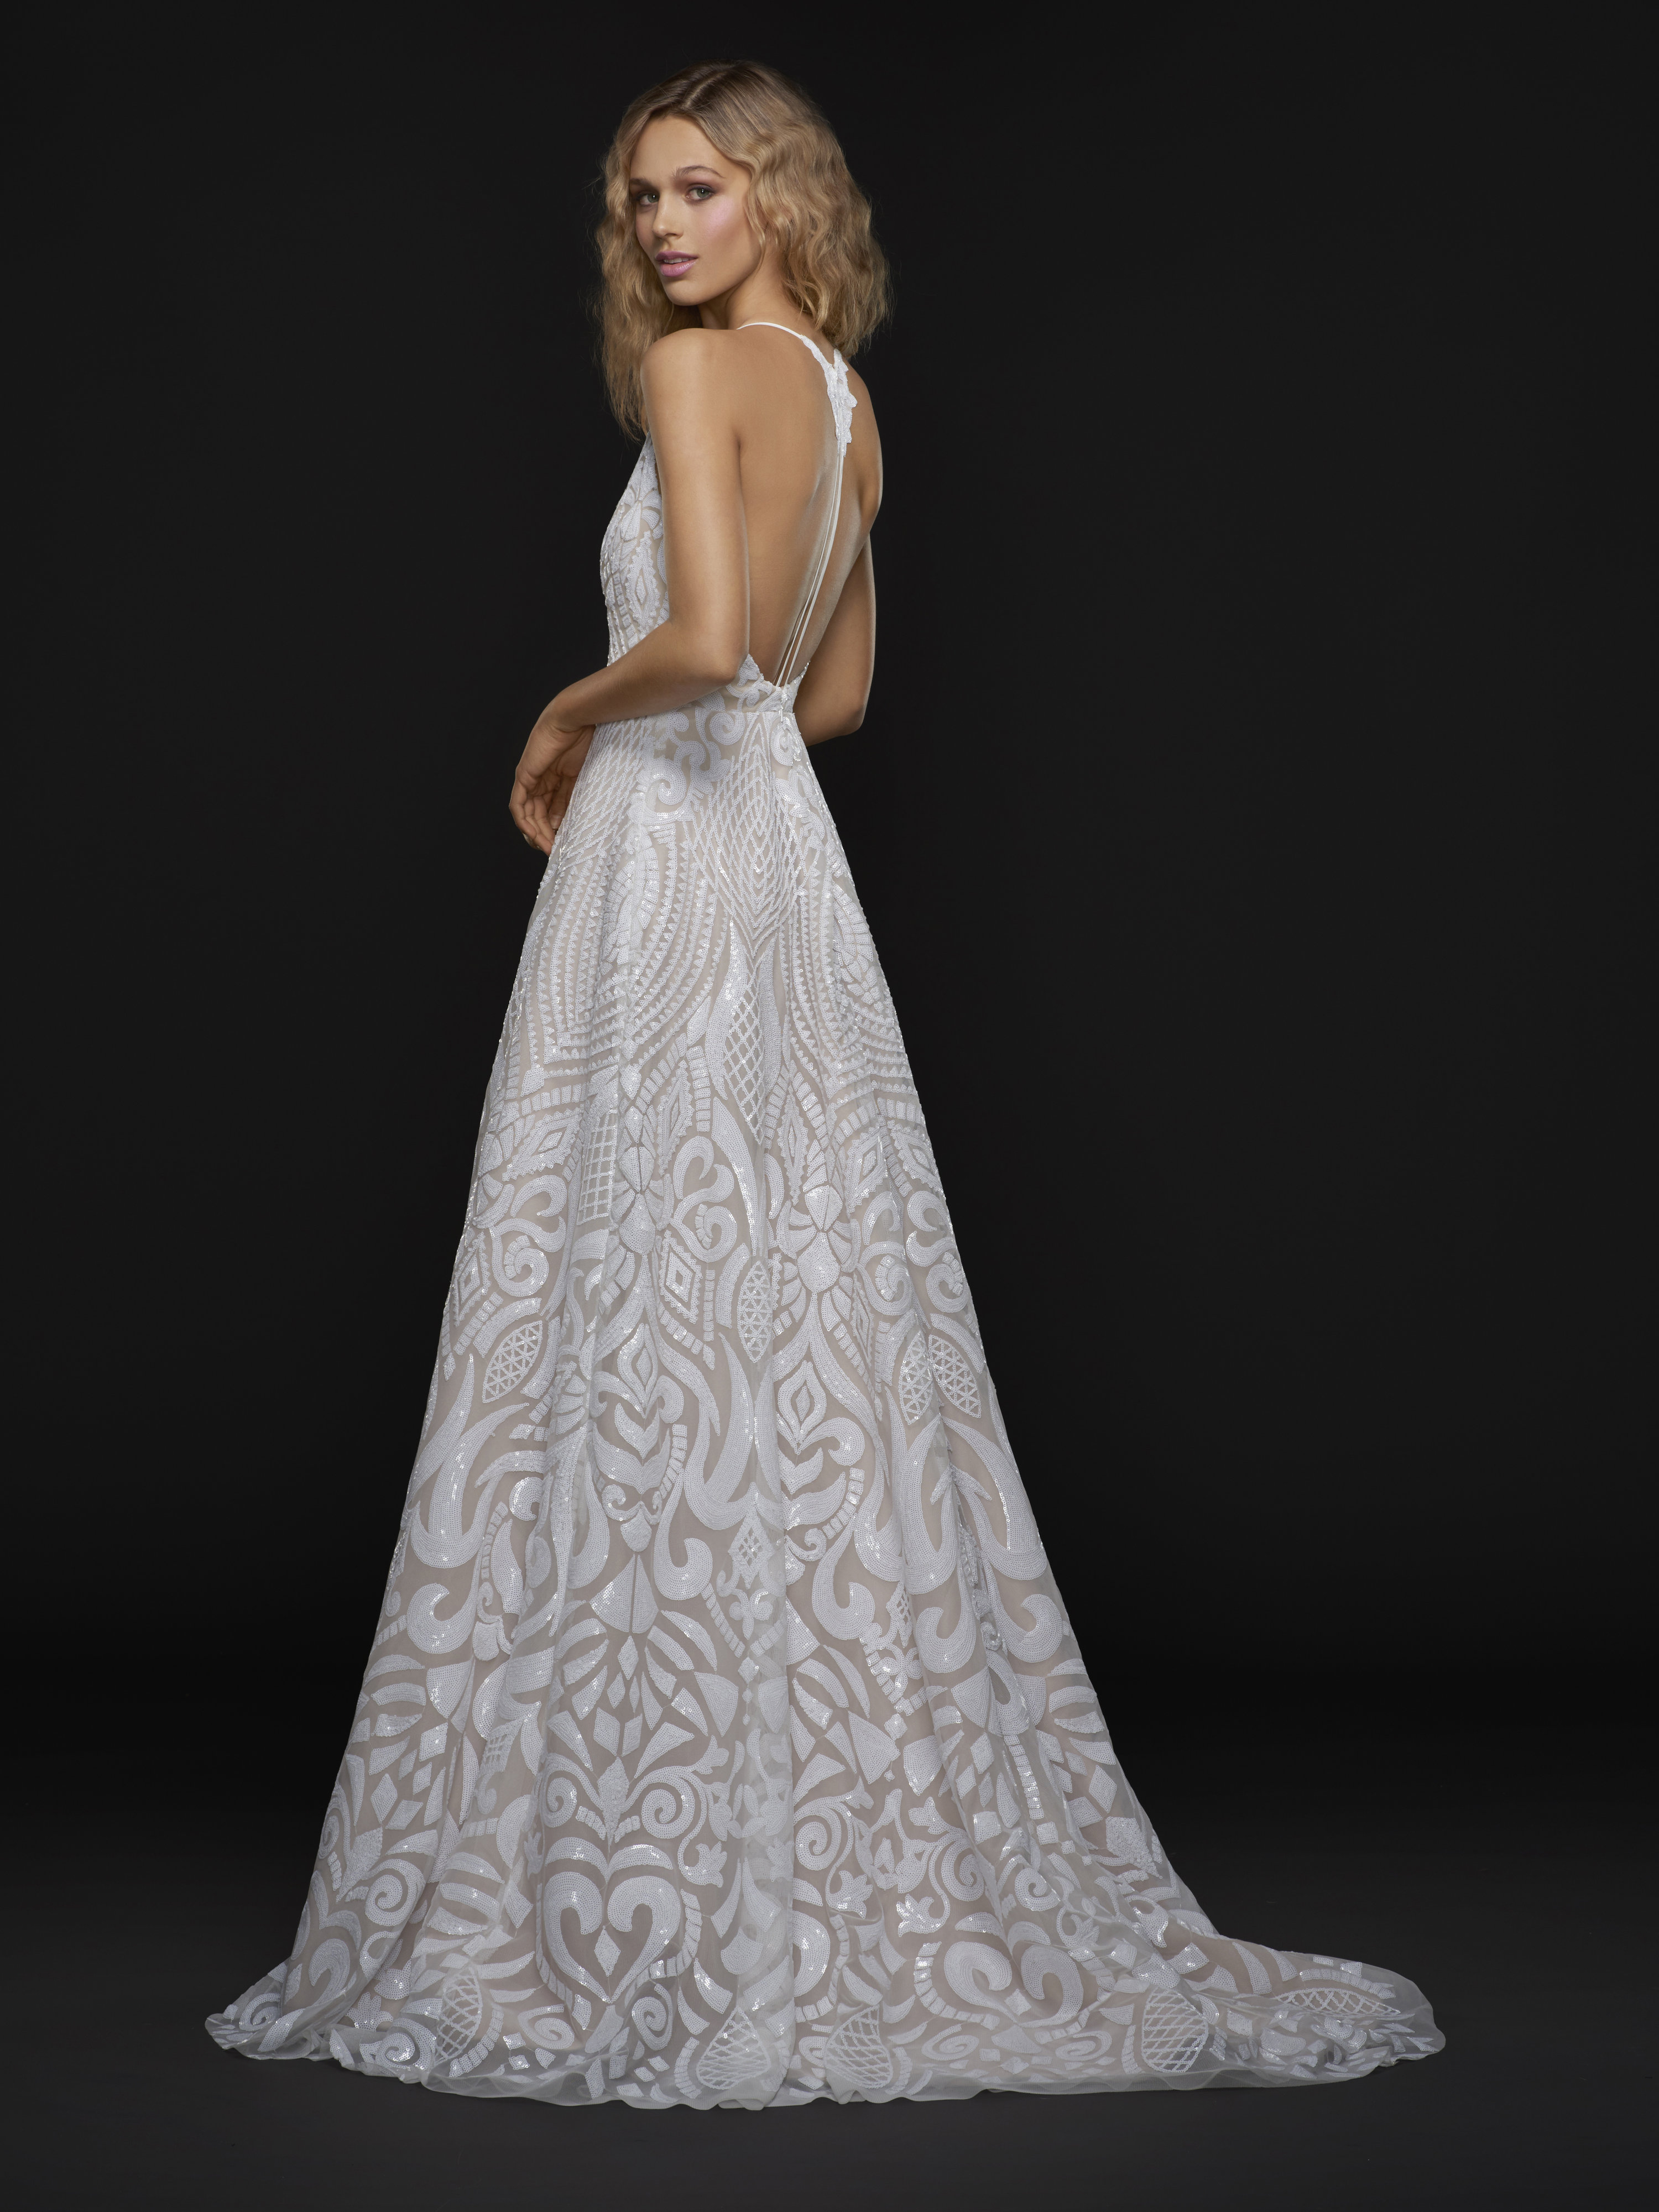 Spaghetti Strap Plunging V-neck Fully Beaded A-line Wedding Dress ...